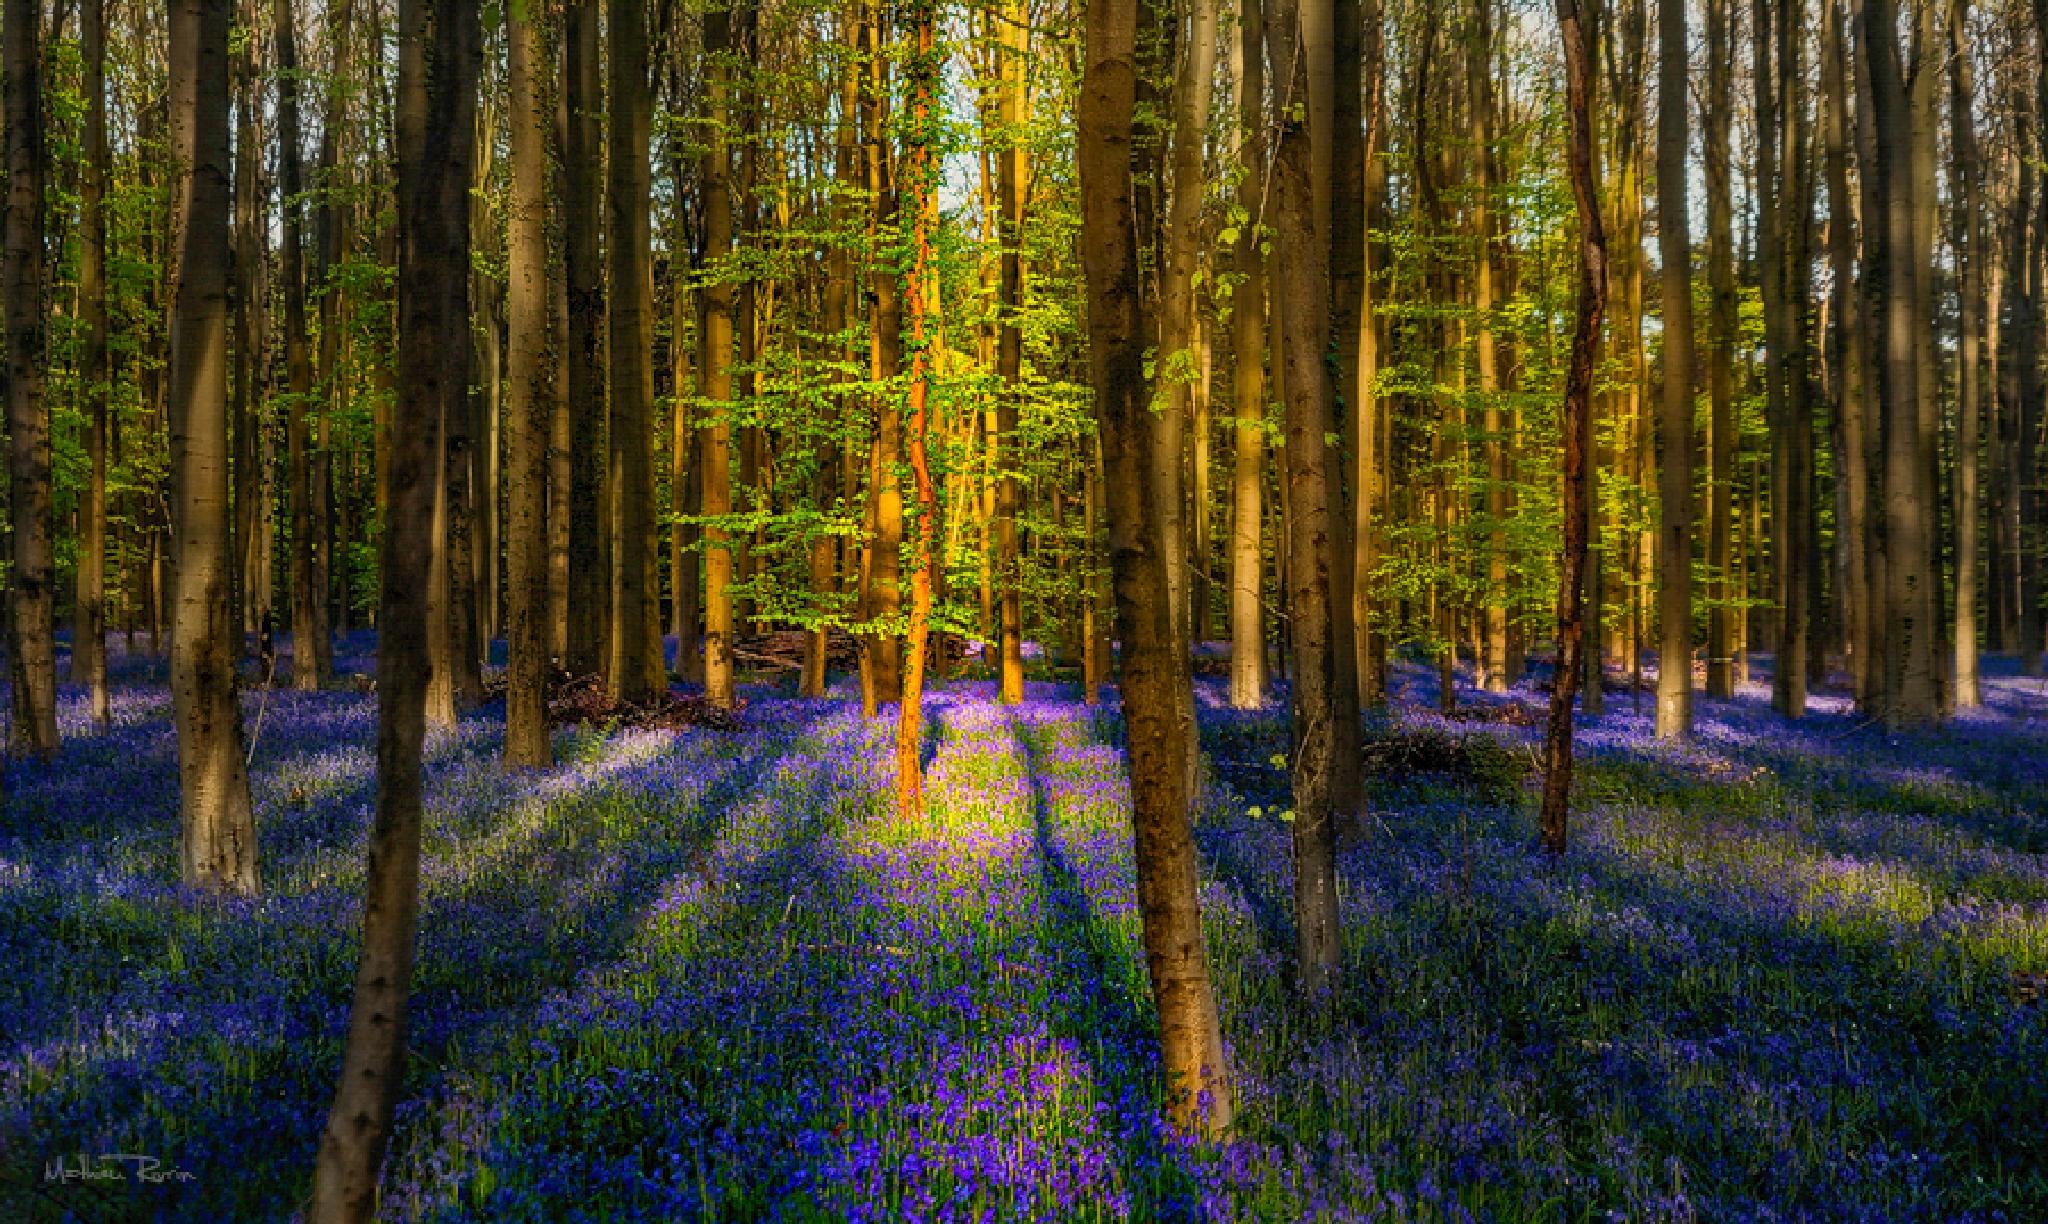 A blue forest by Mathieu_rivrin